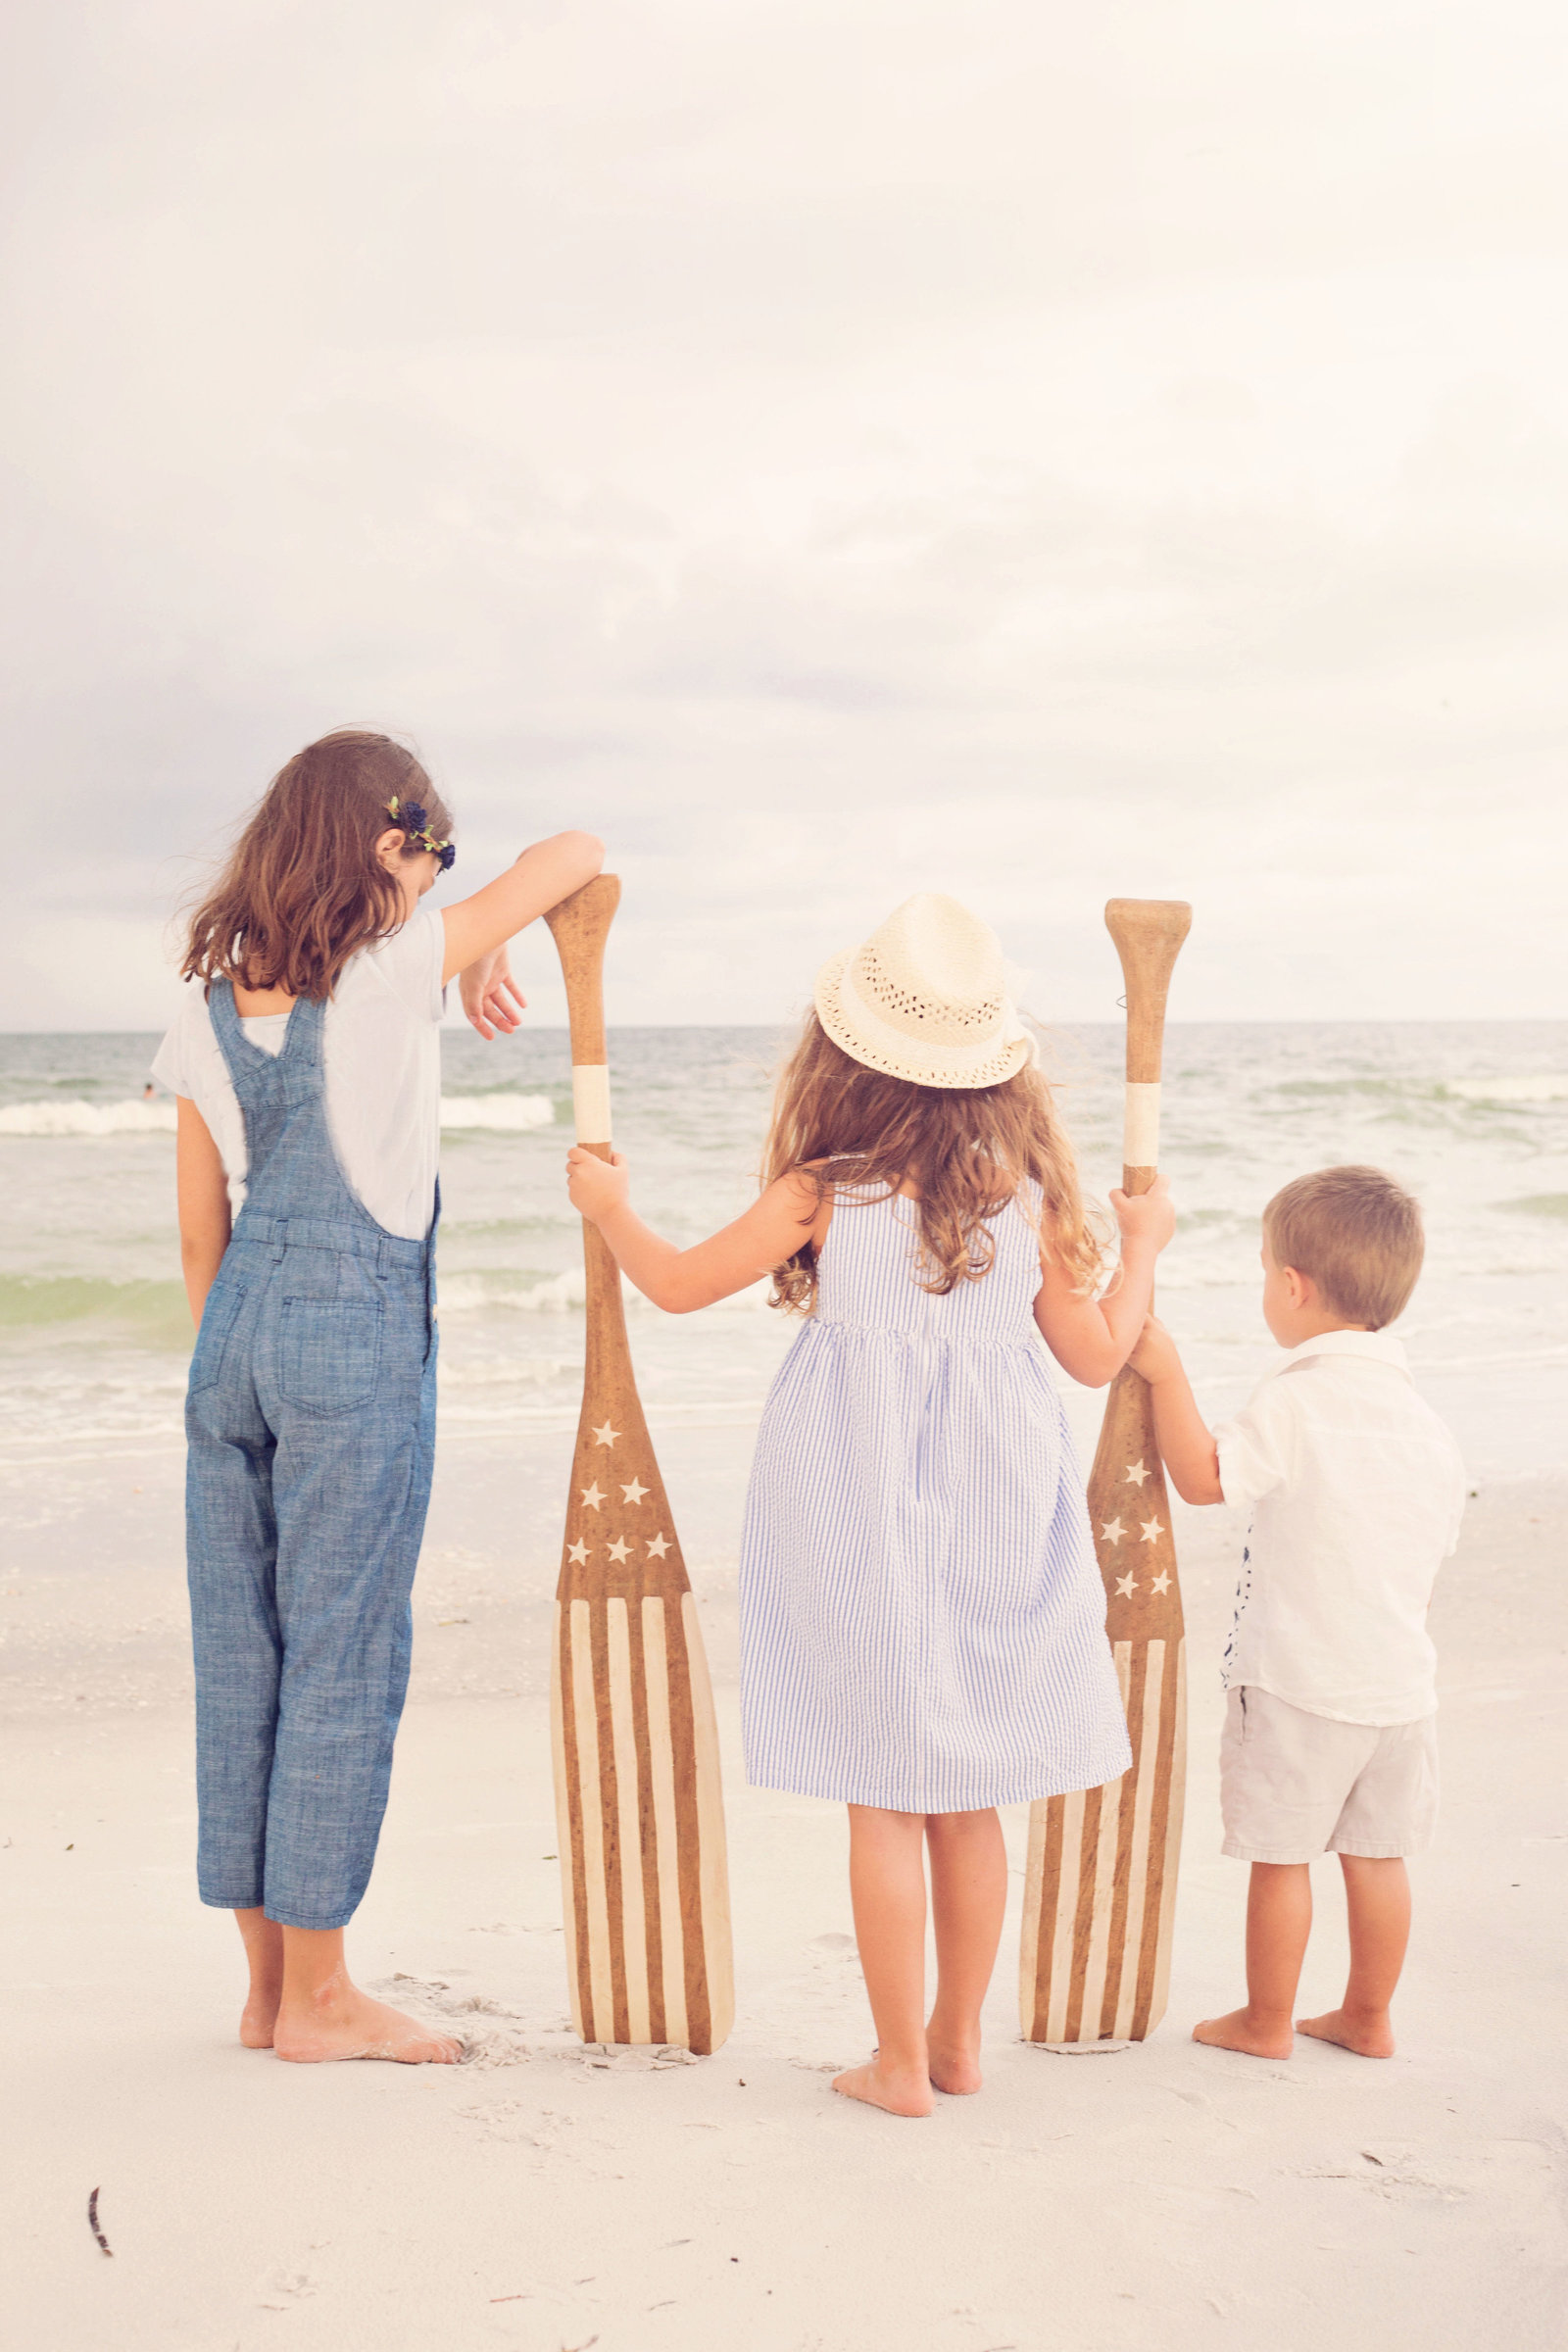 Beach Pics 2015 (24 of 50)c